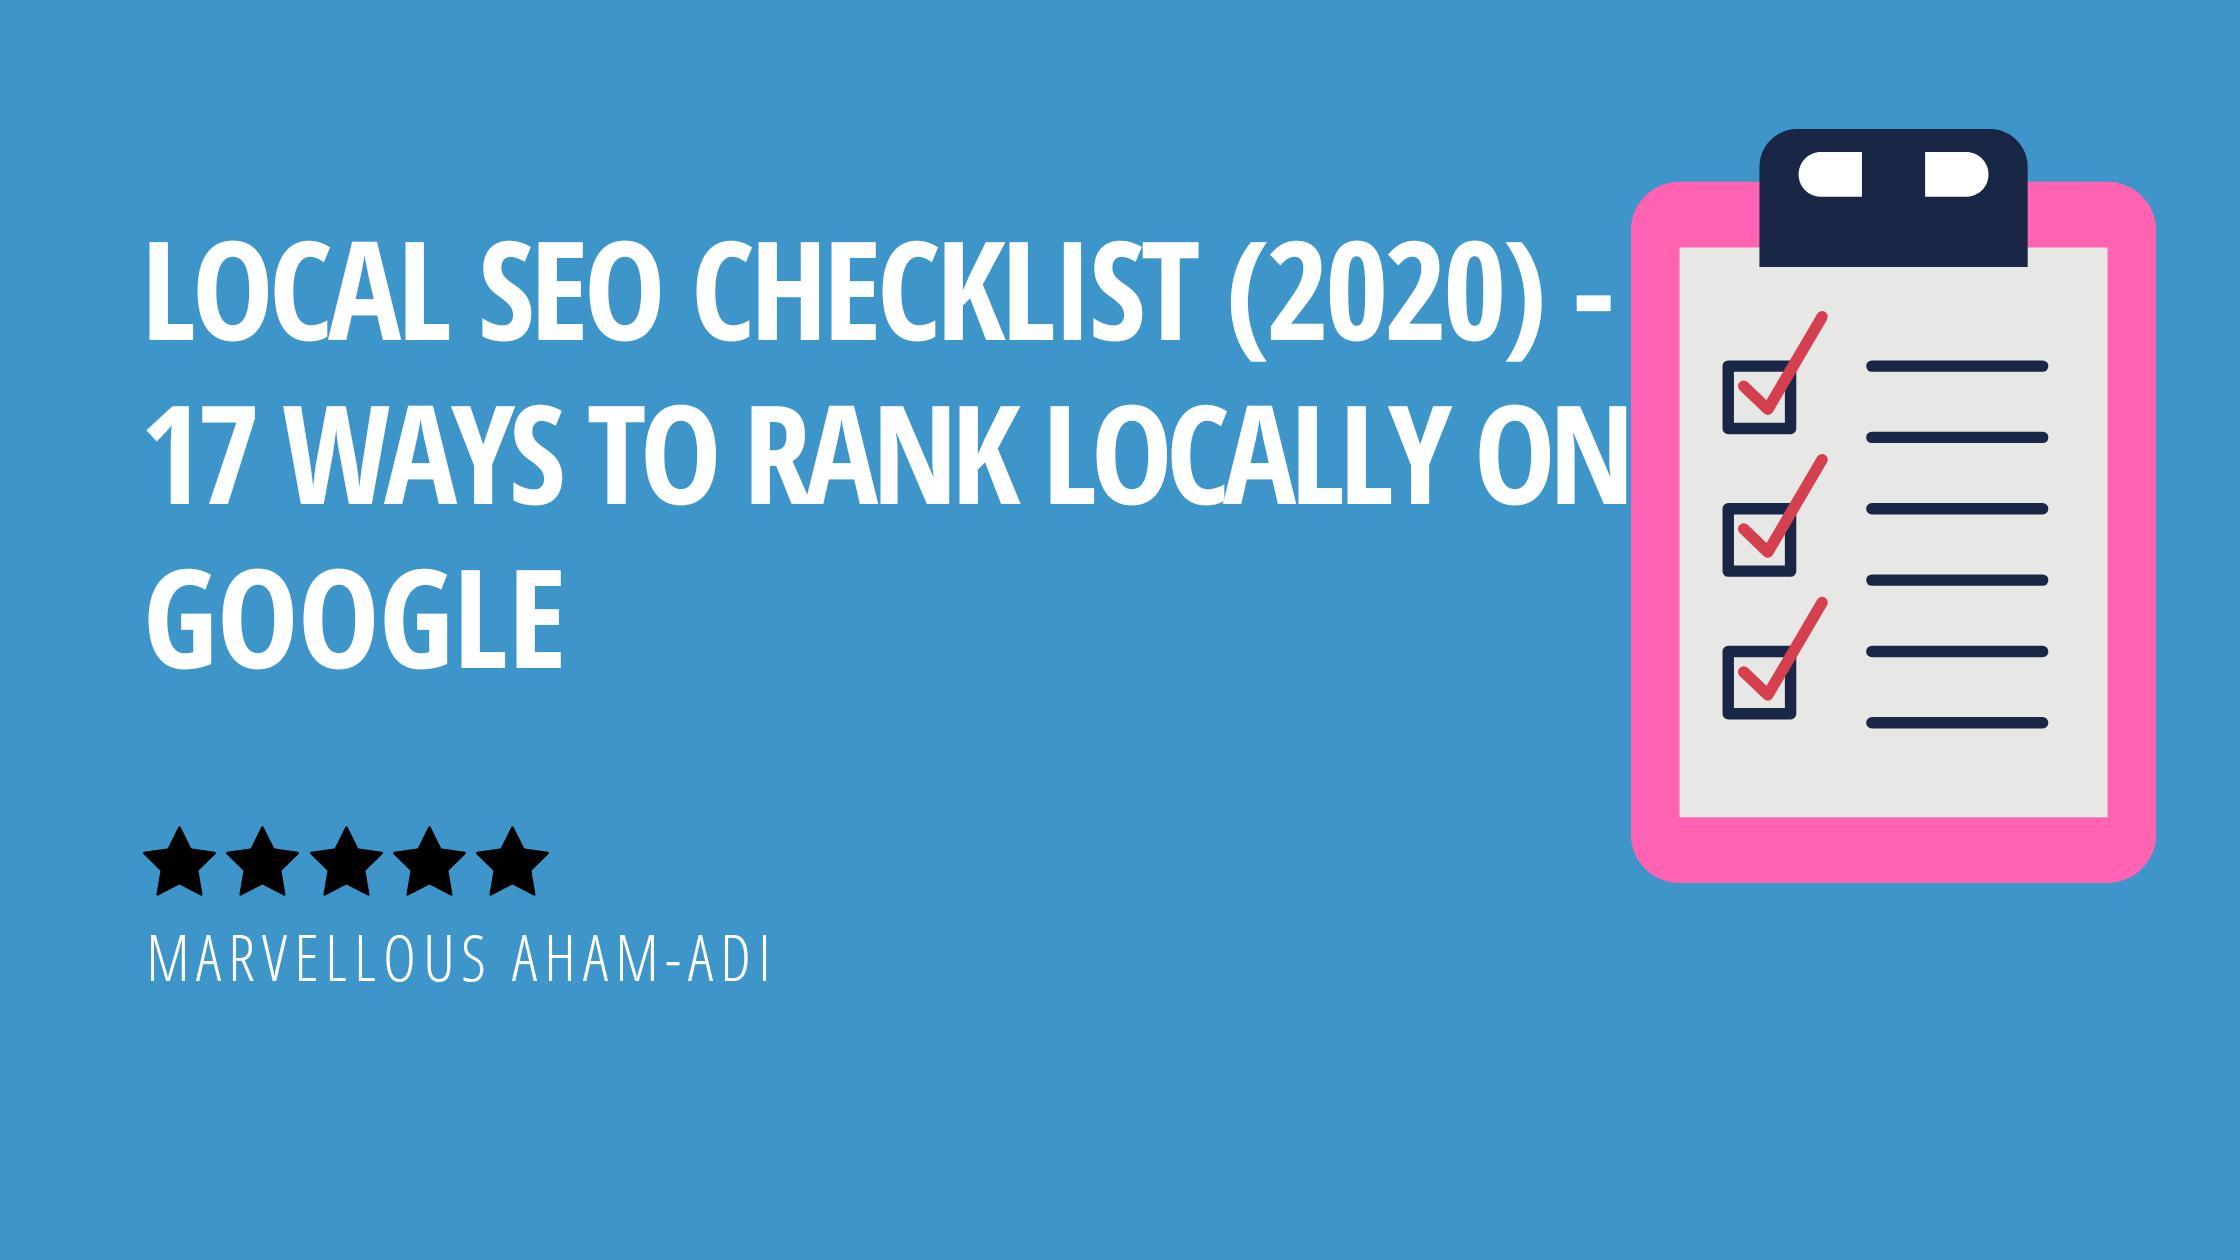 Local SEO Checklist (2020) – 17 Ways to Rank Locally on Google